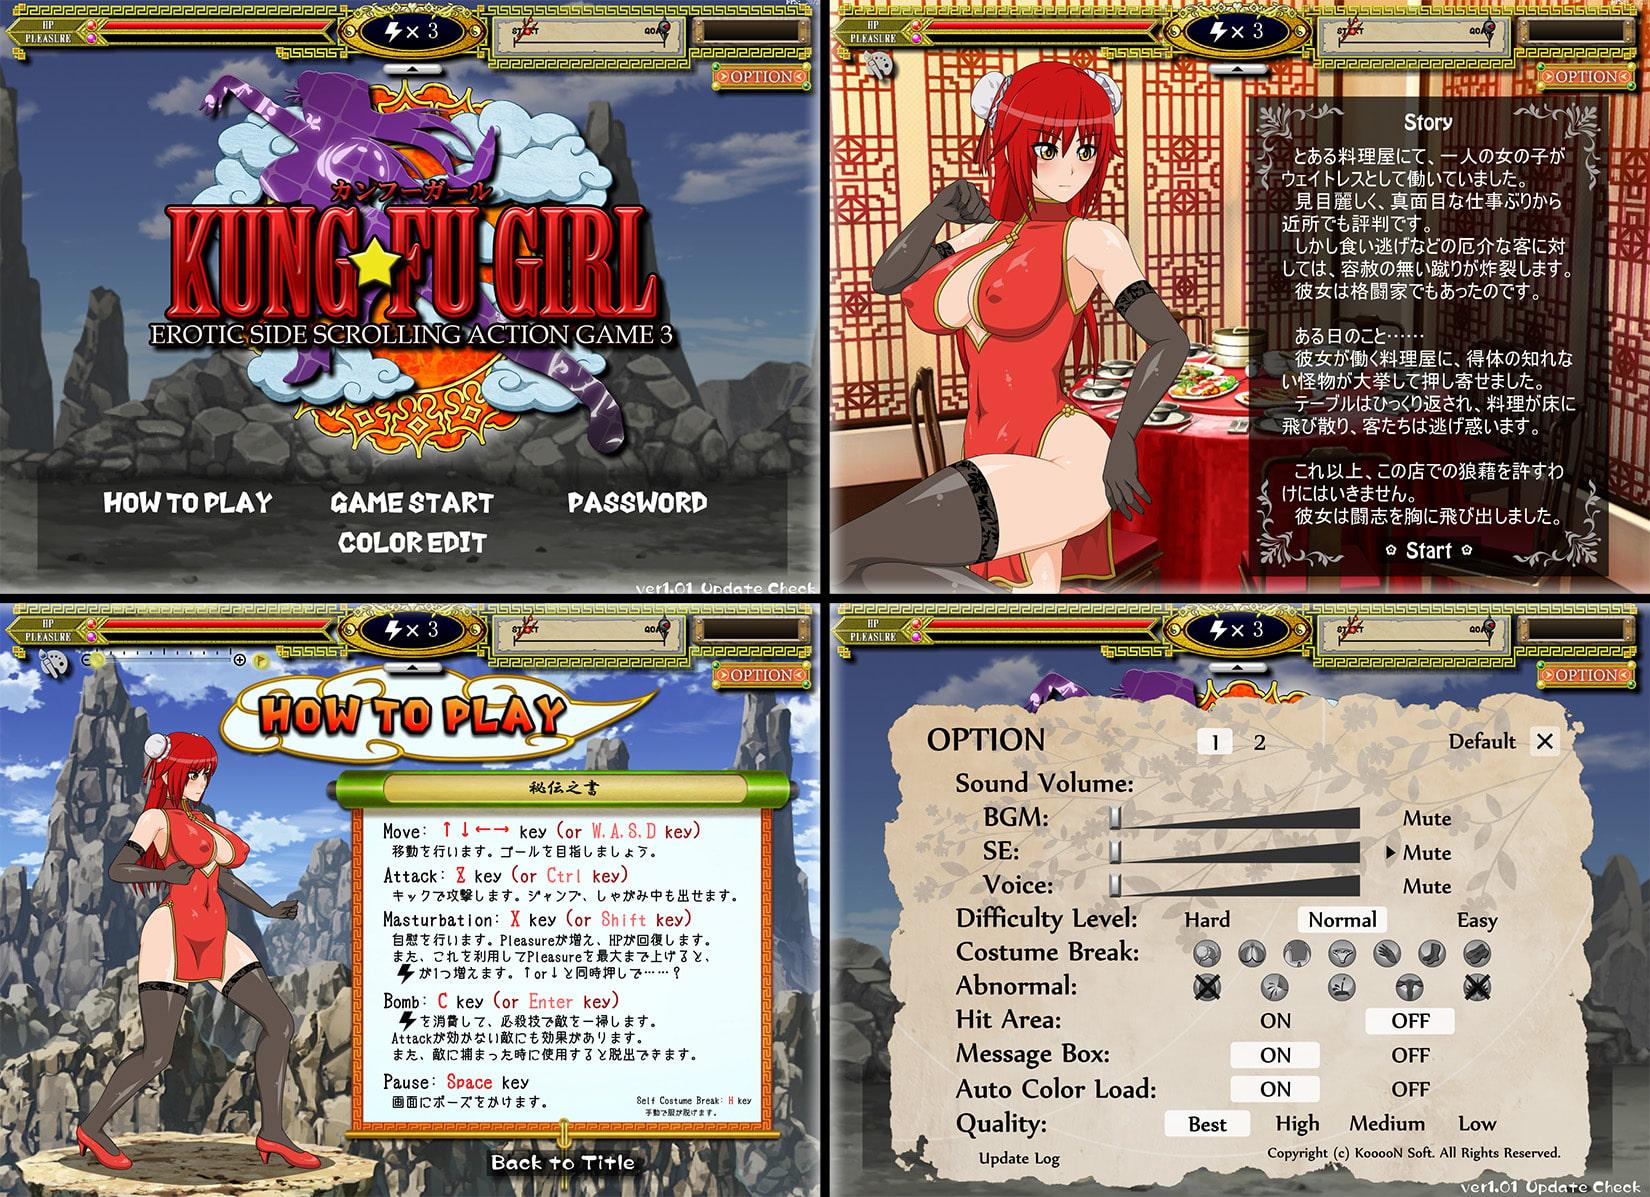 Erotic Side Scrolling Game